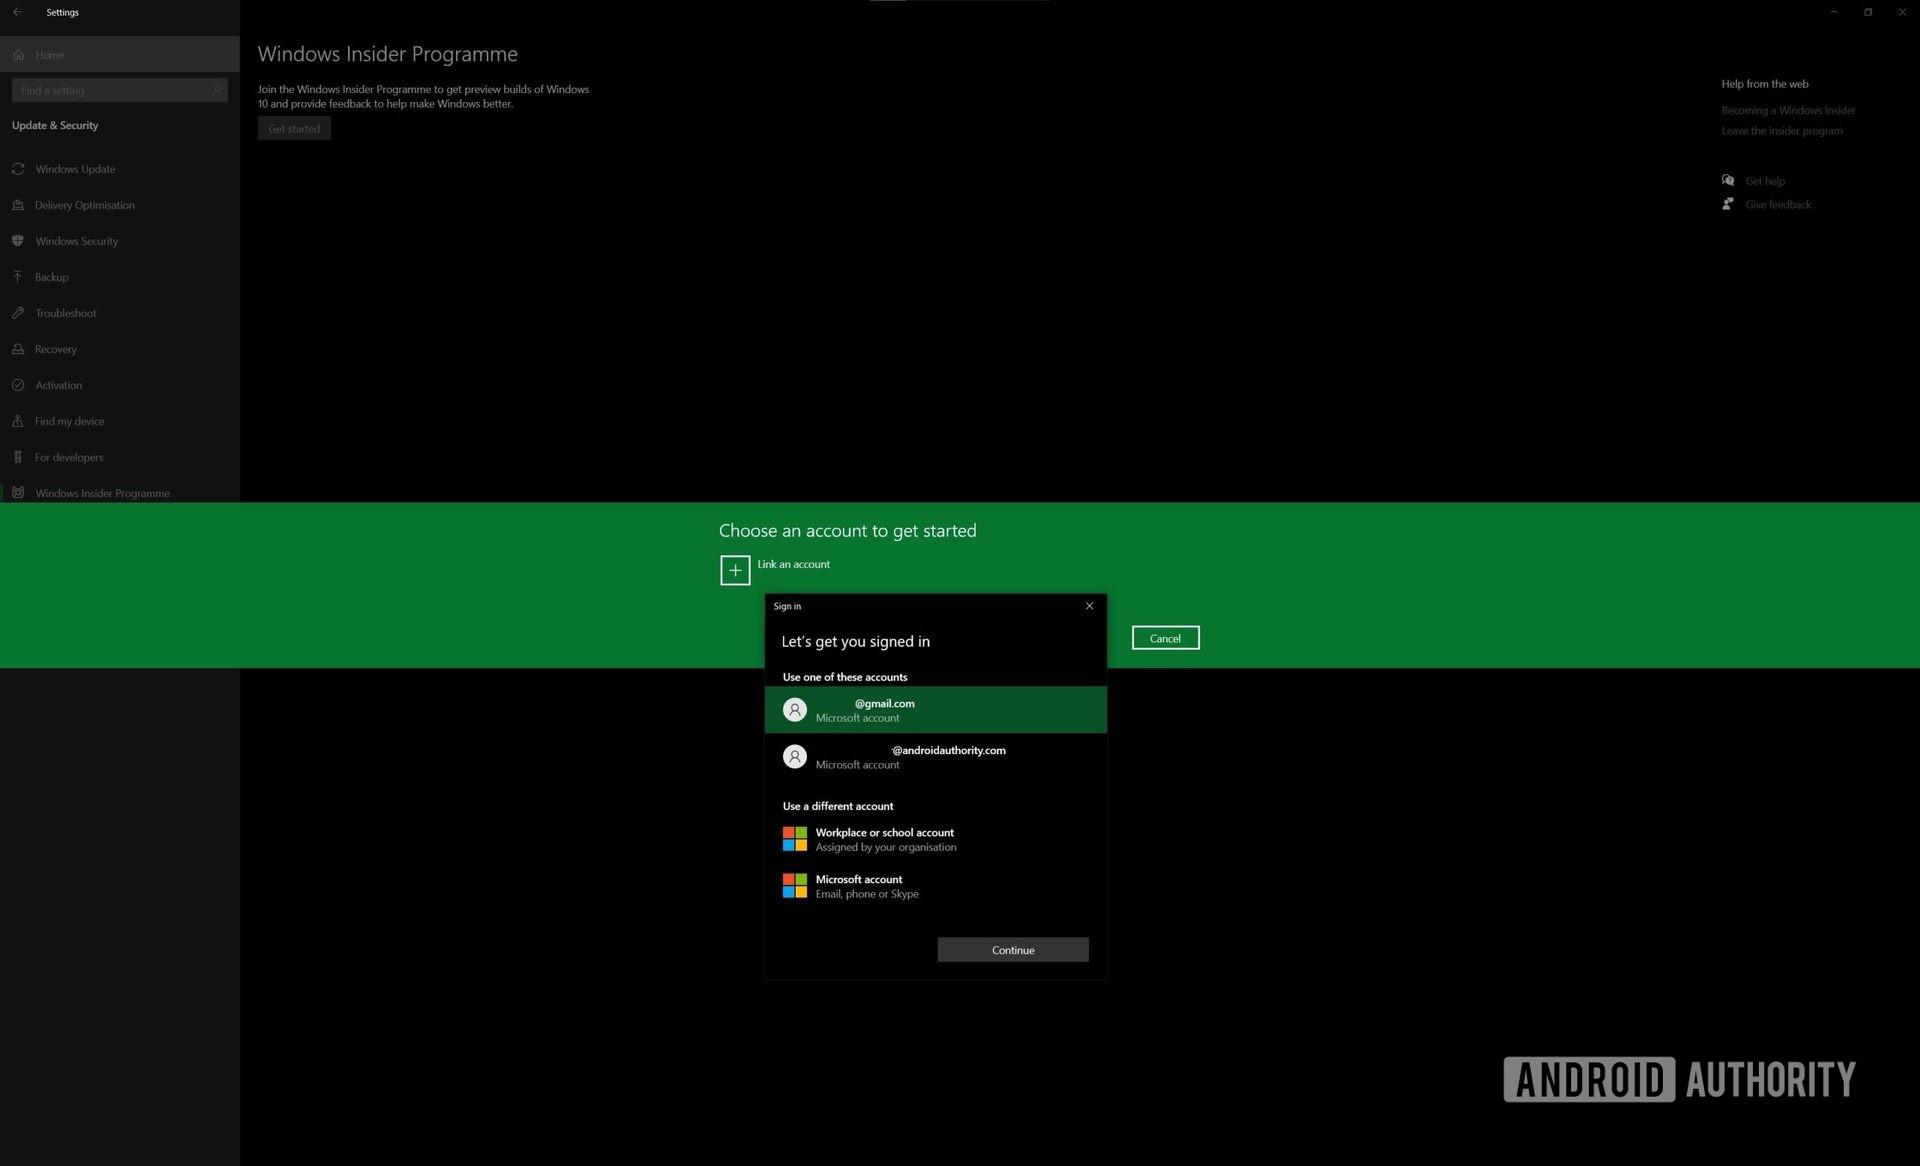 Windows Insider Program link account selection